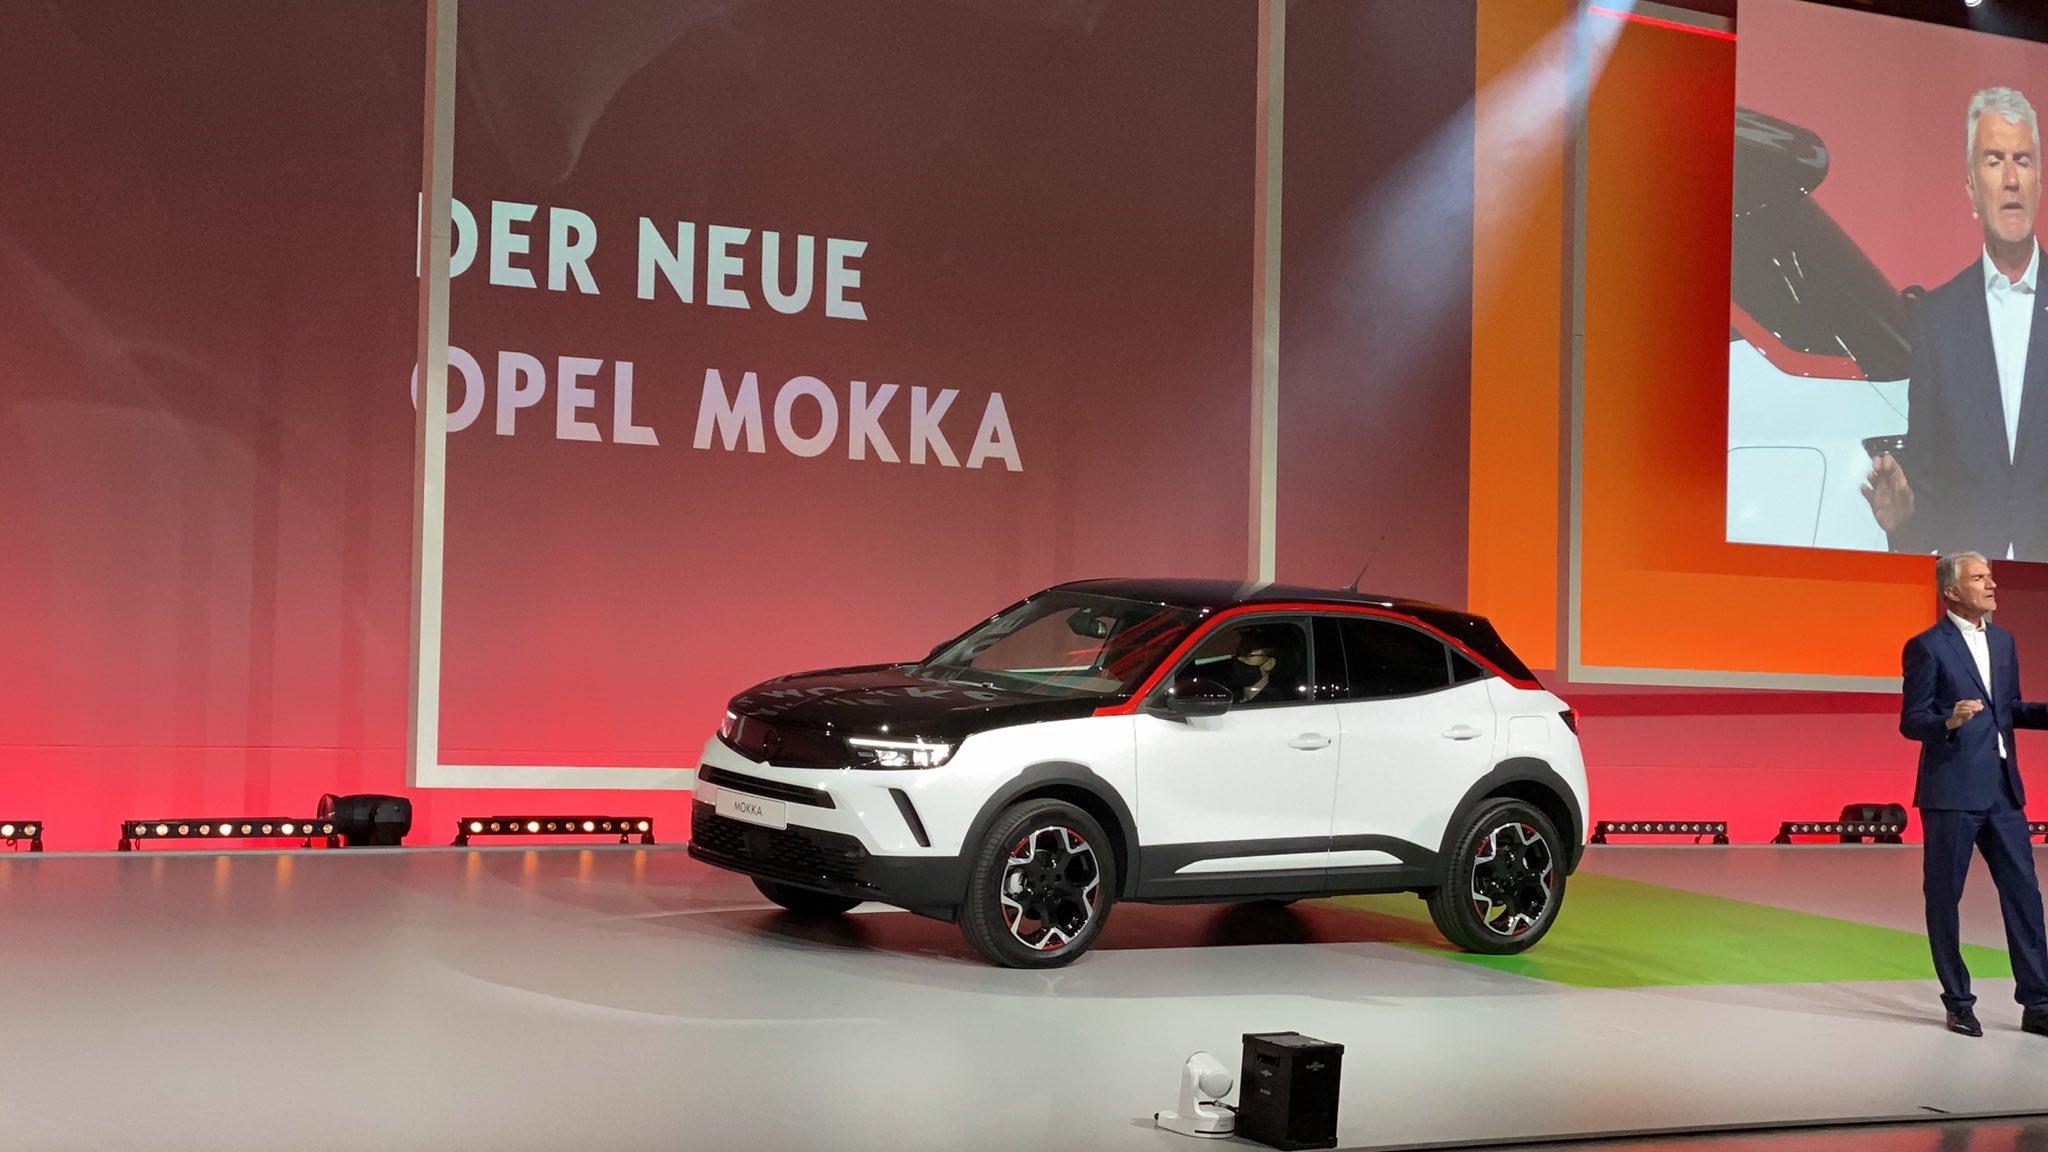 2020 - [Opel] Mokka II [P2QO] EigpnguXkAEWi_t?format=jpg&name=large